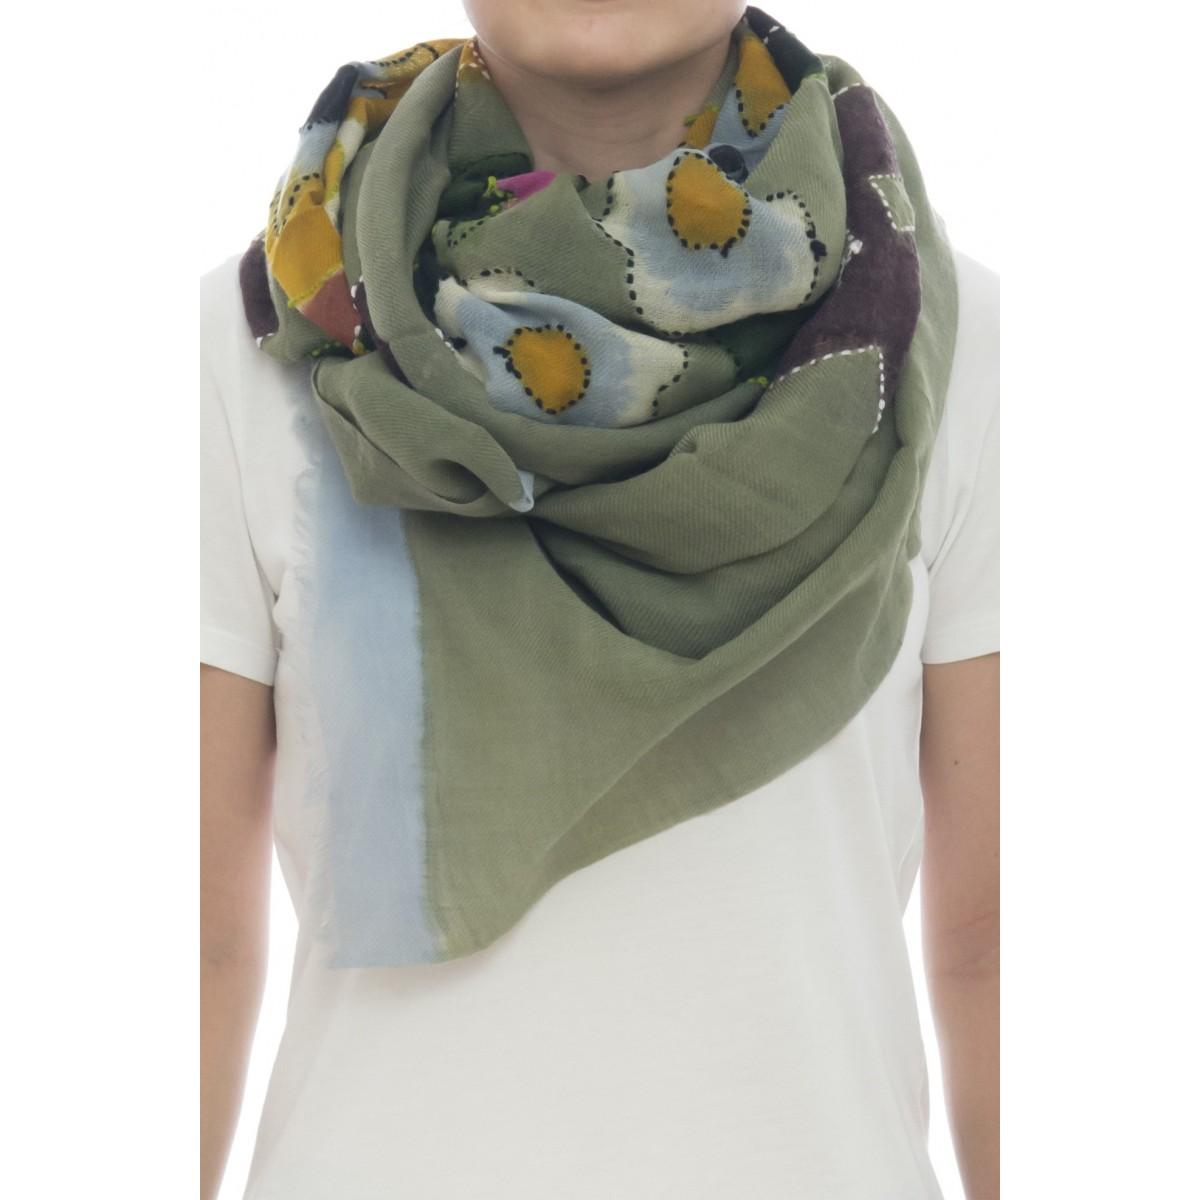 Sciarpa - Giglio 7210  100 x 200   100% lana dipinta a mano